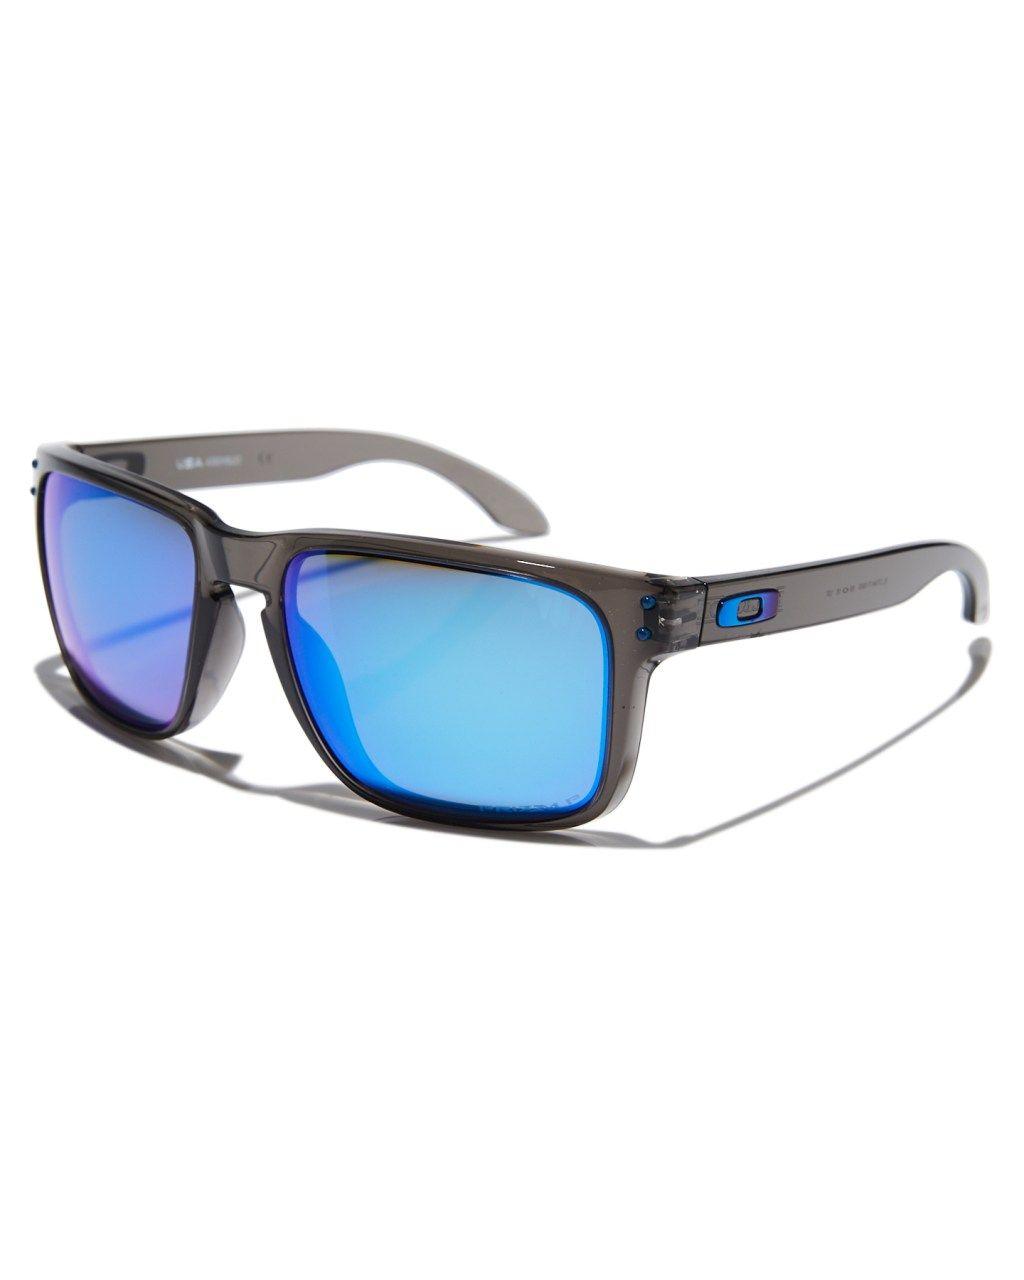 24c9bb284 Oakley Holbrook Xl Polarized Sunglasses Grey Smoke Prizm Mens sunglasses  Size